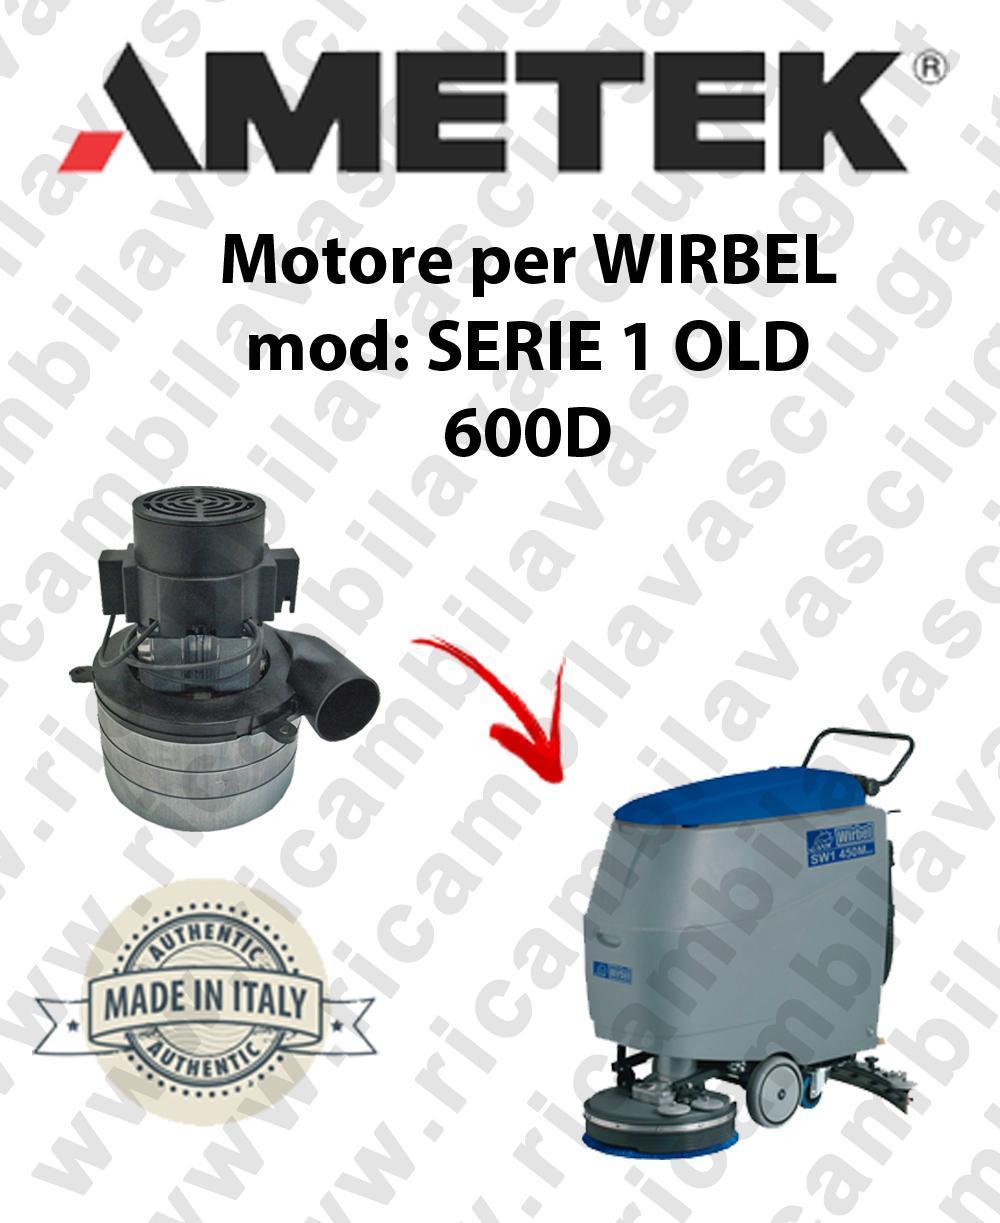 SERIE 1 OLD 600D Motore de aspiración AMETEK para fregadora WIRBEL